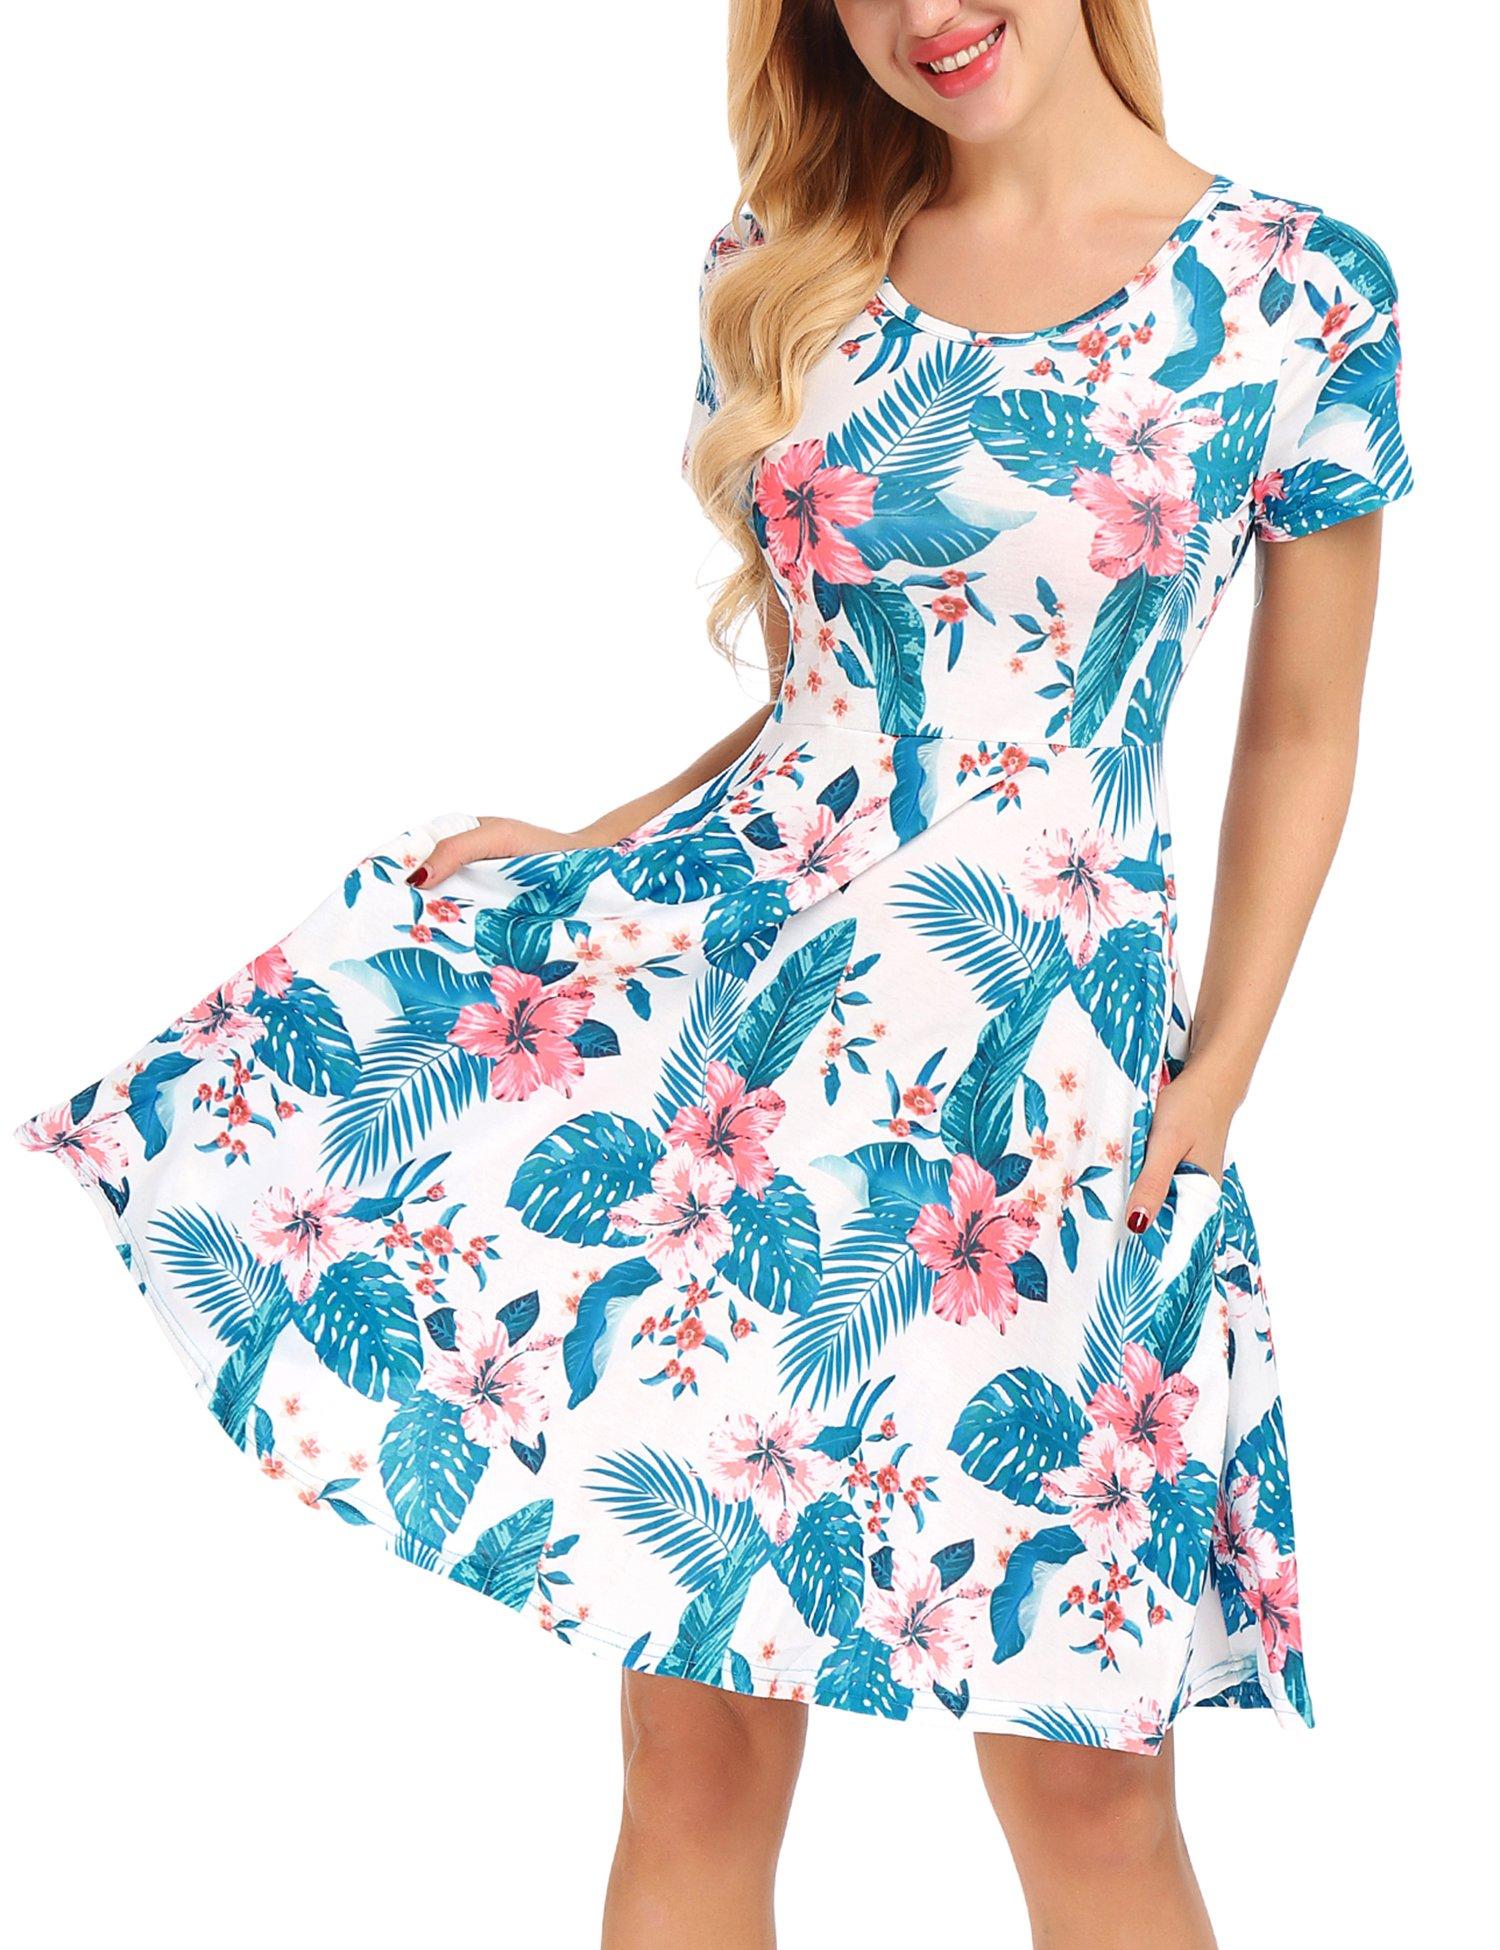 Uniboutique Women Short Sleeve Round Neck Summer Casual Flared Midi Dress